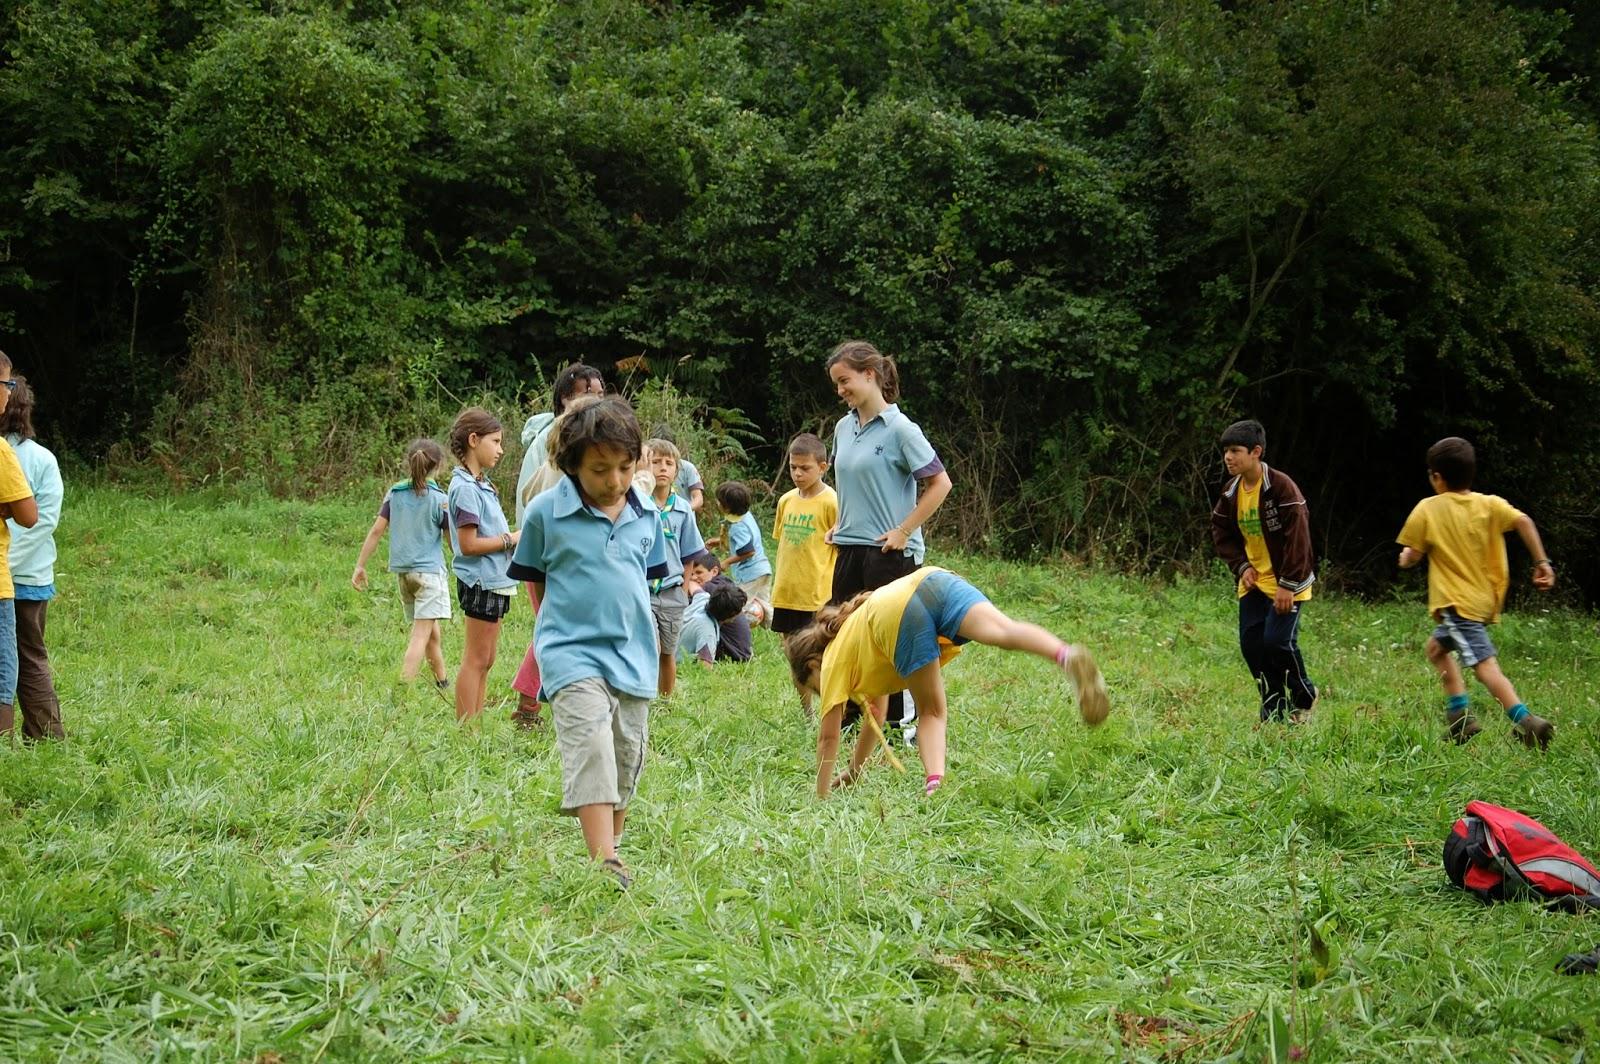 Campaments Estiu RolandKing 2011 - DSC_0091%2B2.JPG